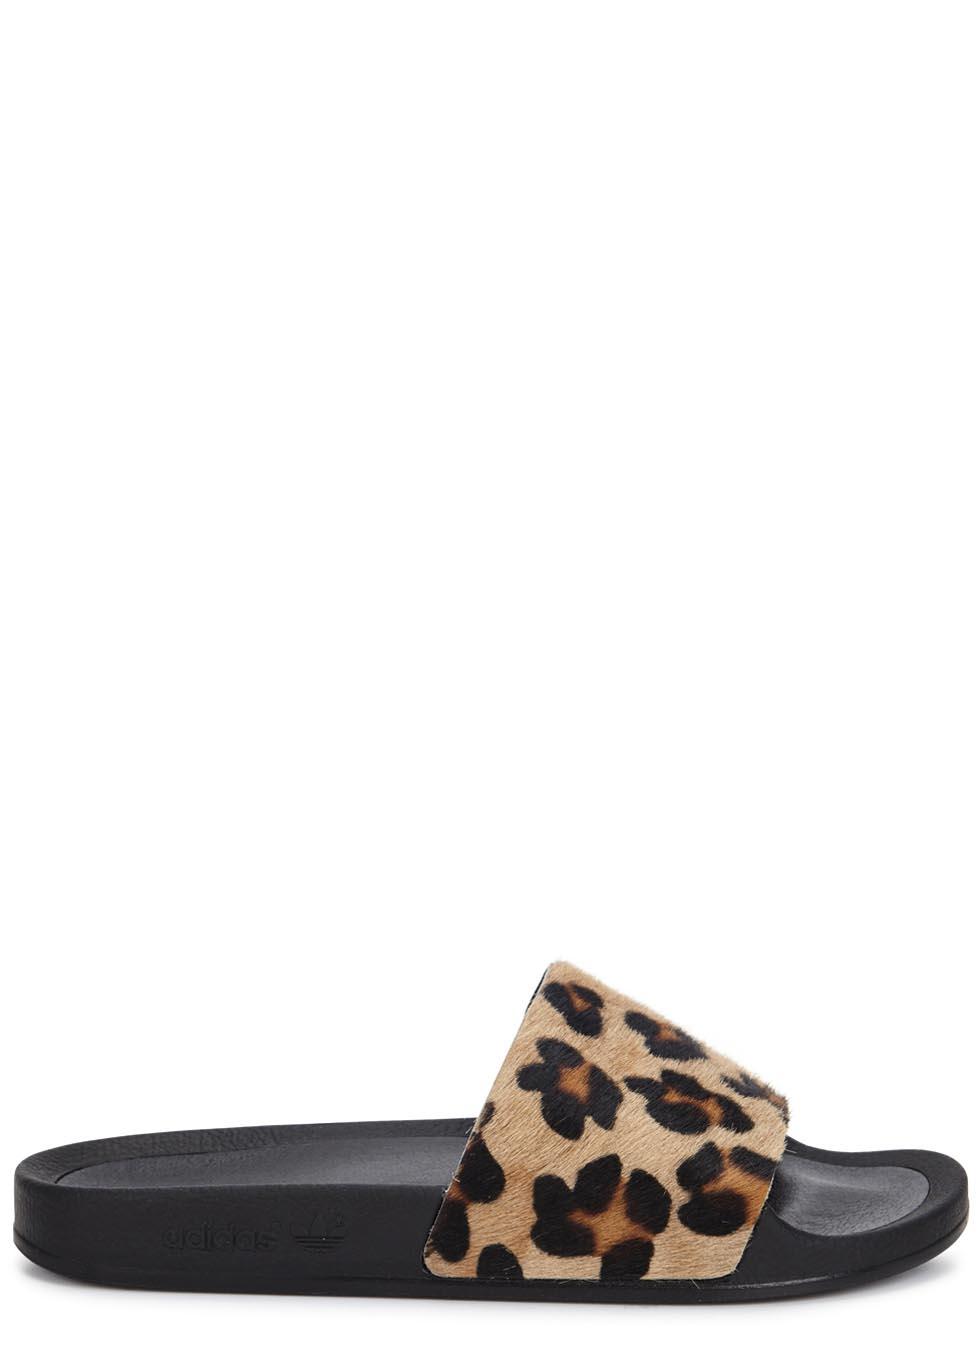 b191e17e0737 adidas Originals Adilette Leopard-print Calf Hair Sliders - Lyst